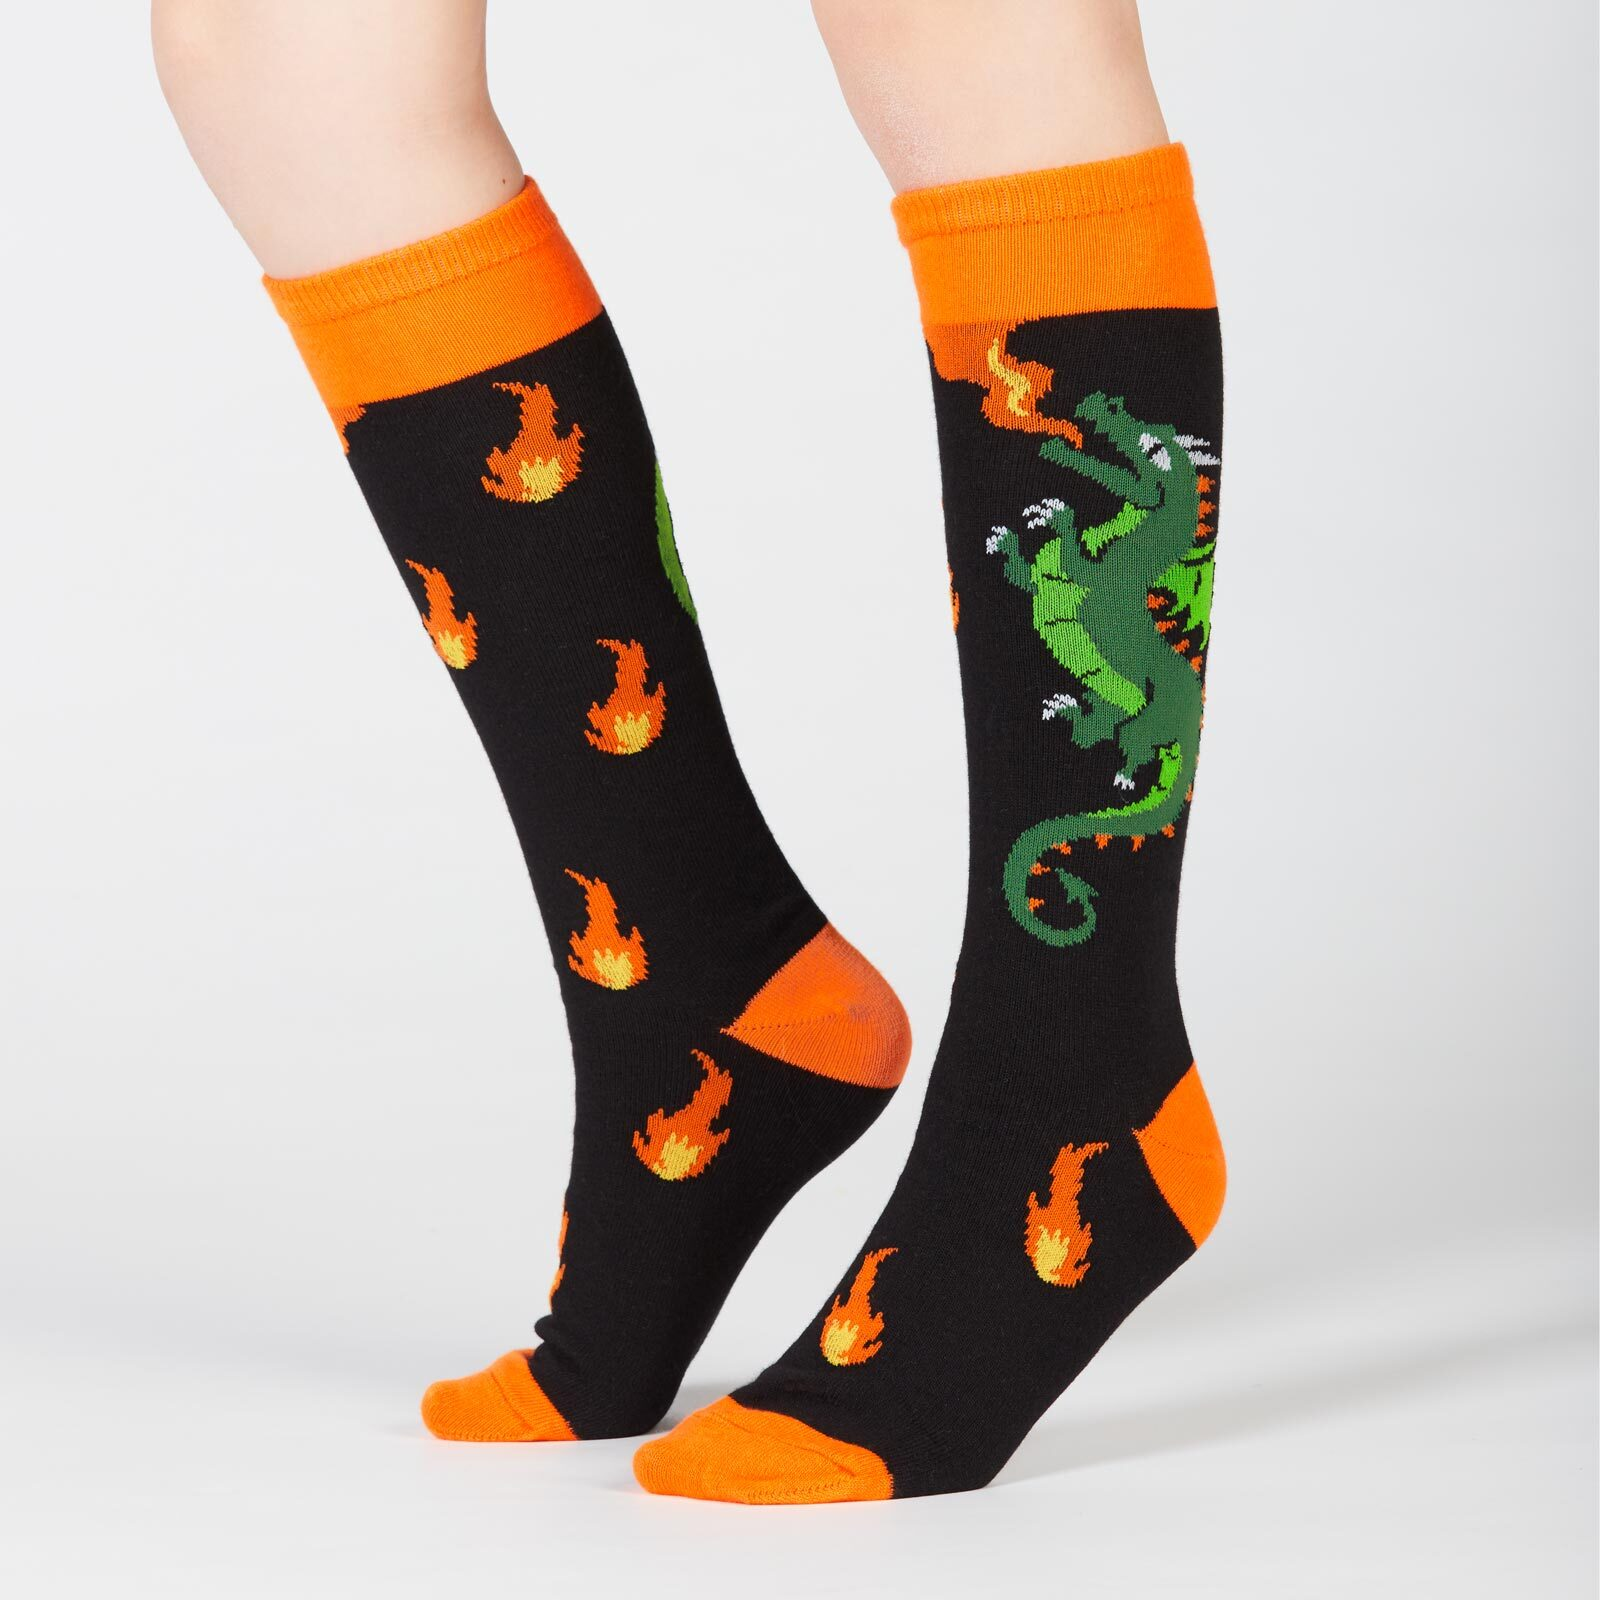 model wearing Spitfire - Dragon Knee High Socks Black and Orange - Youth